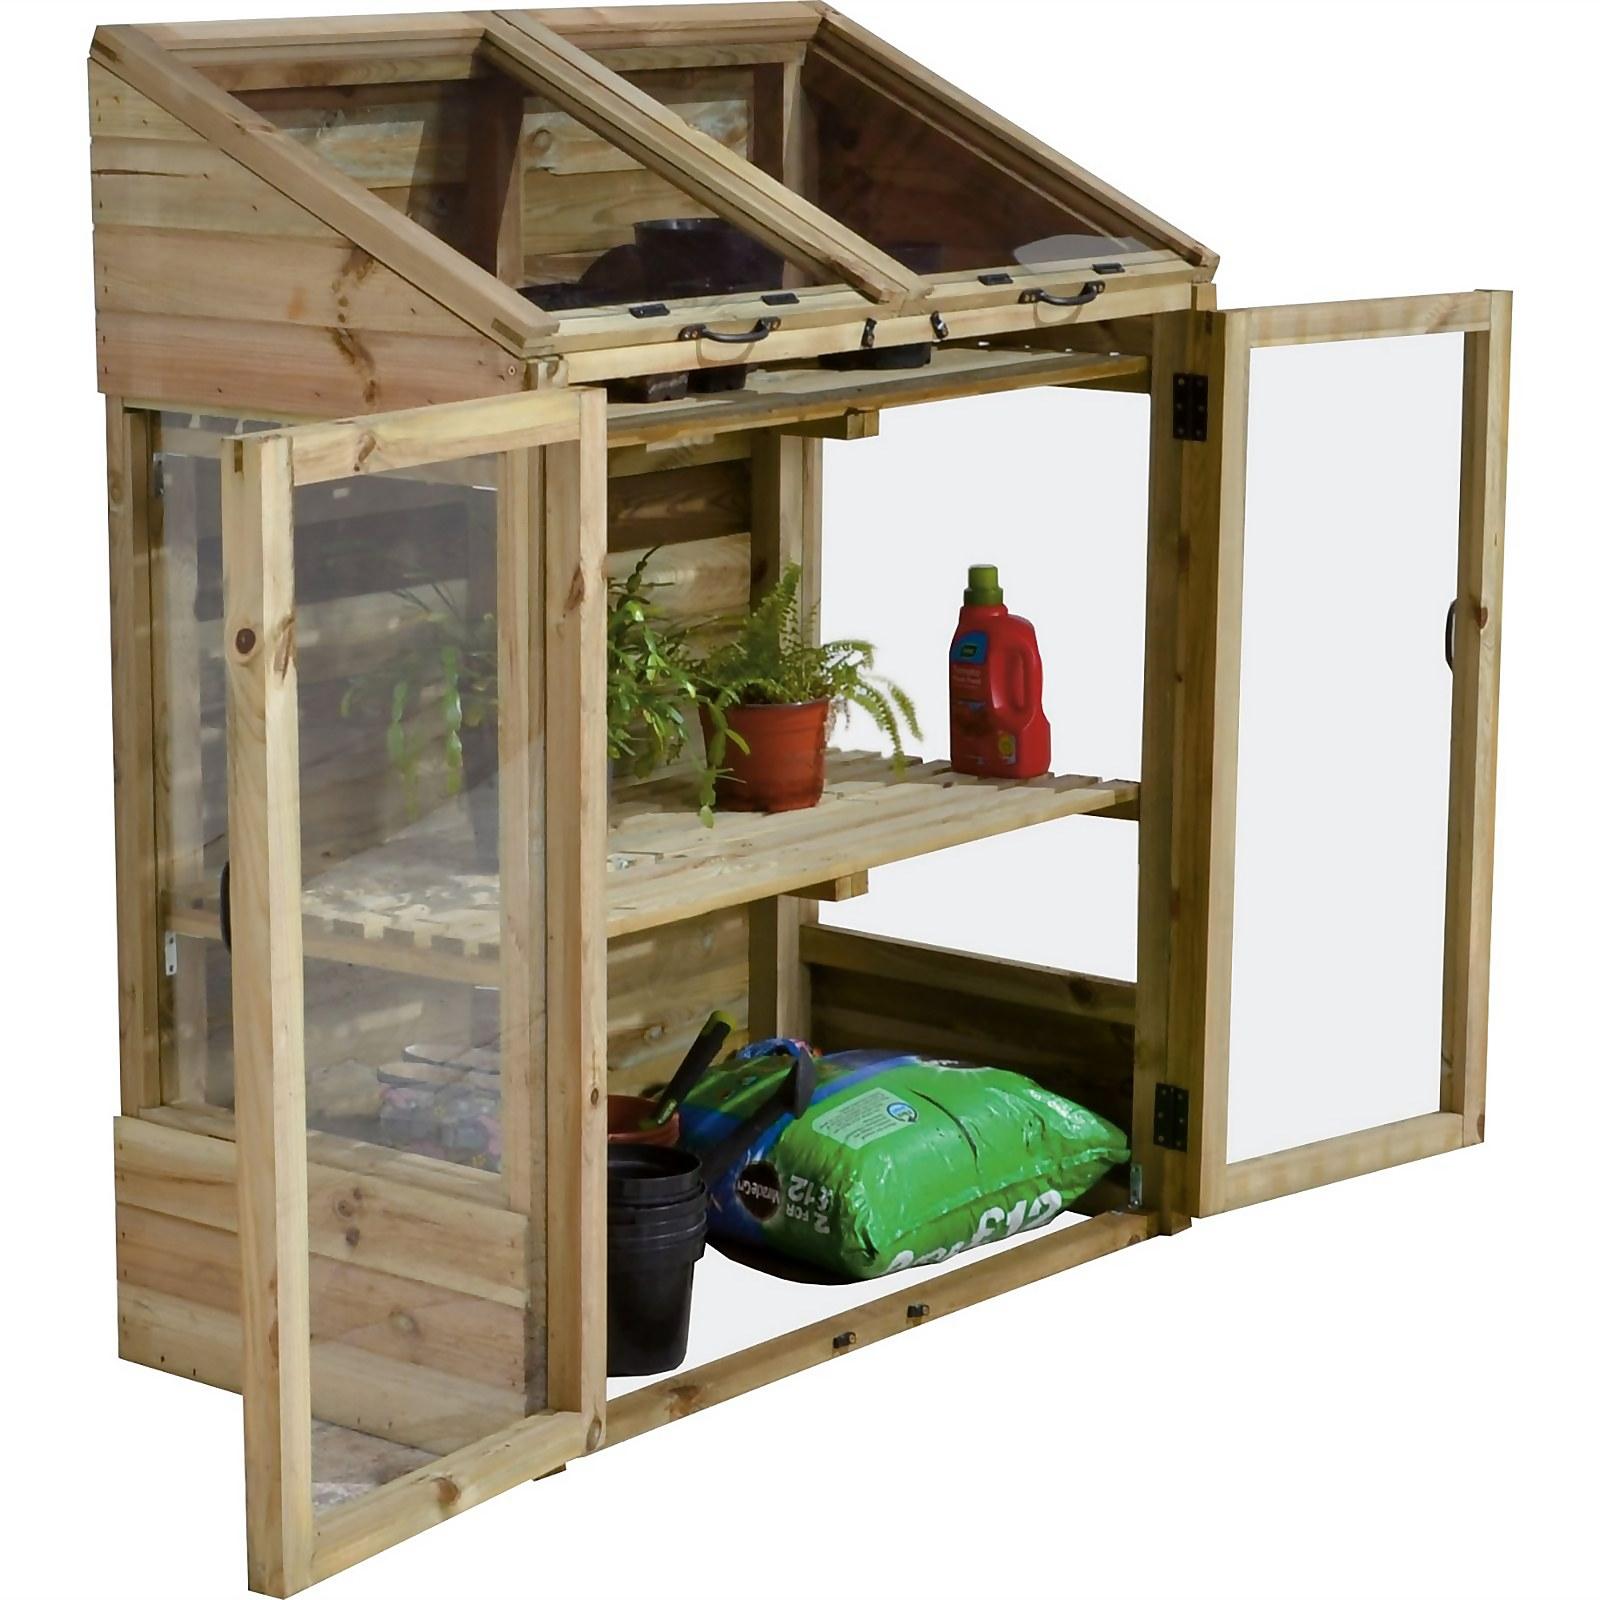 Forest 144 x 120cm Mini Greenhouse